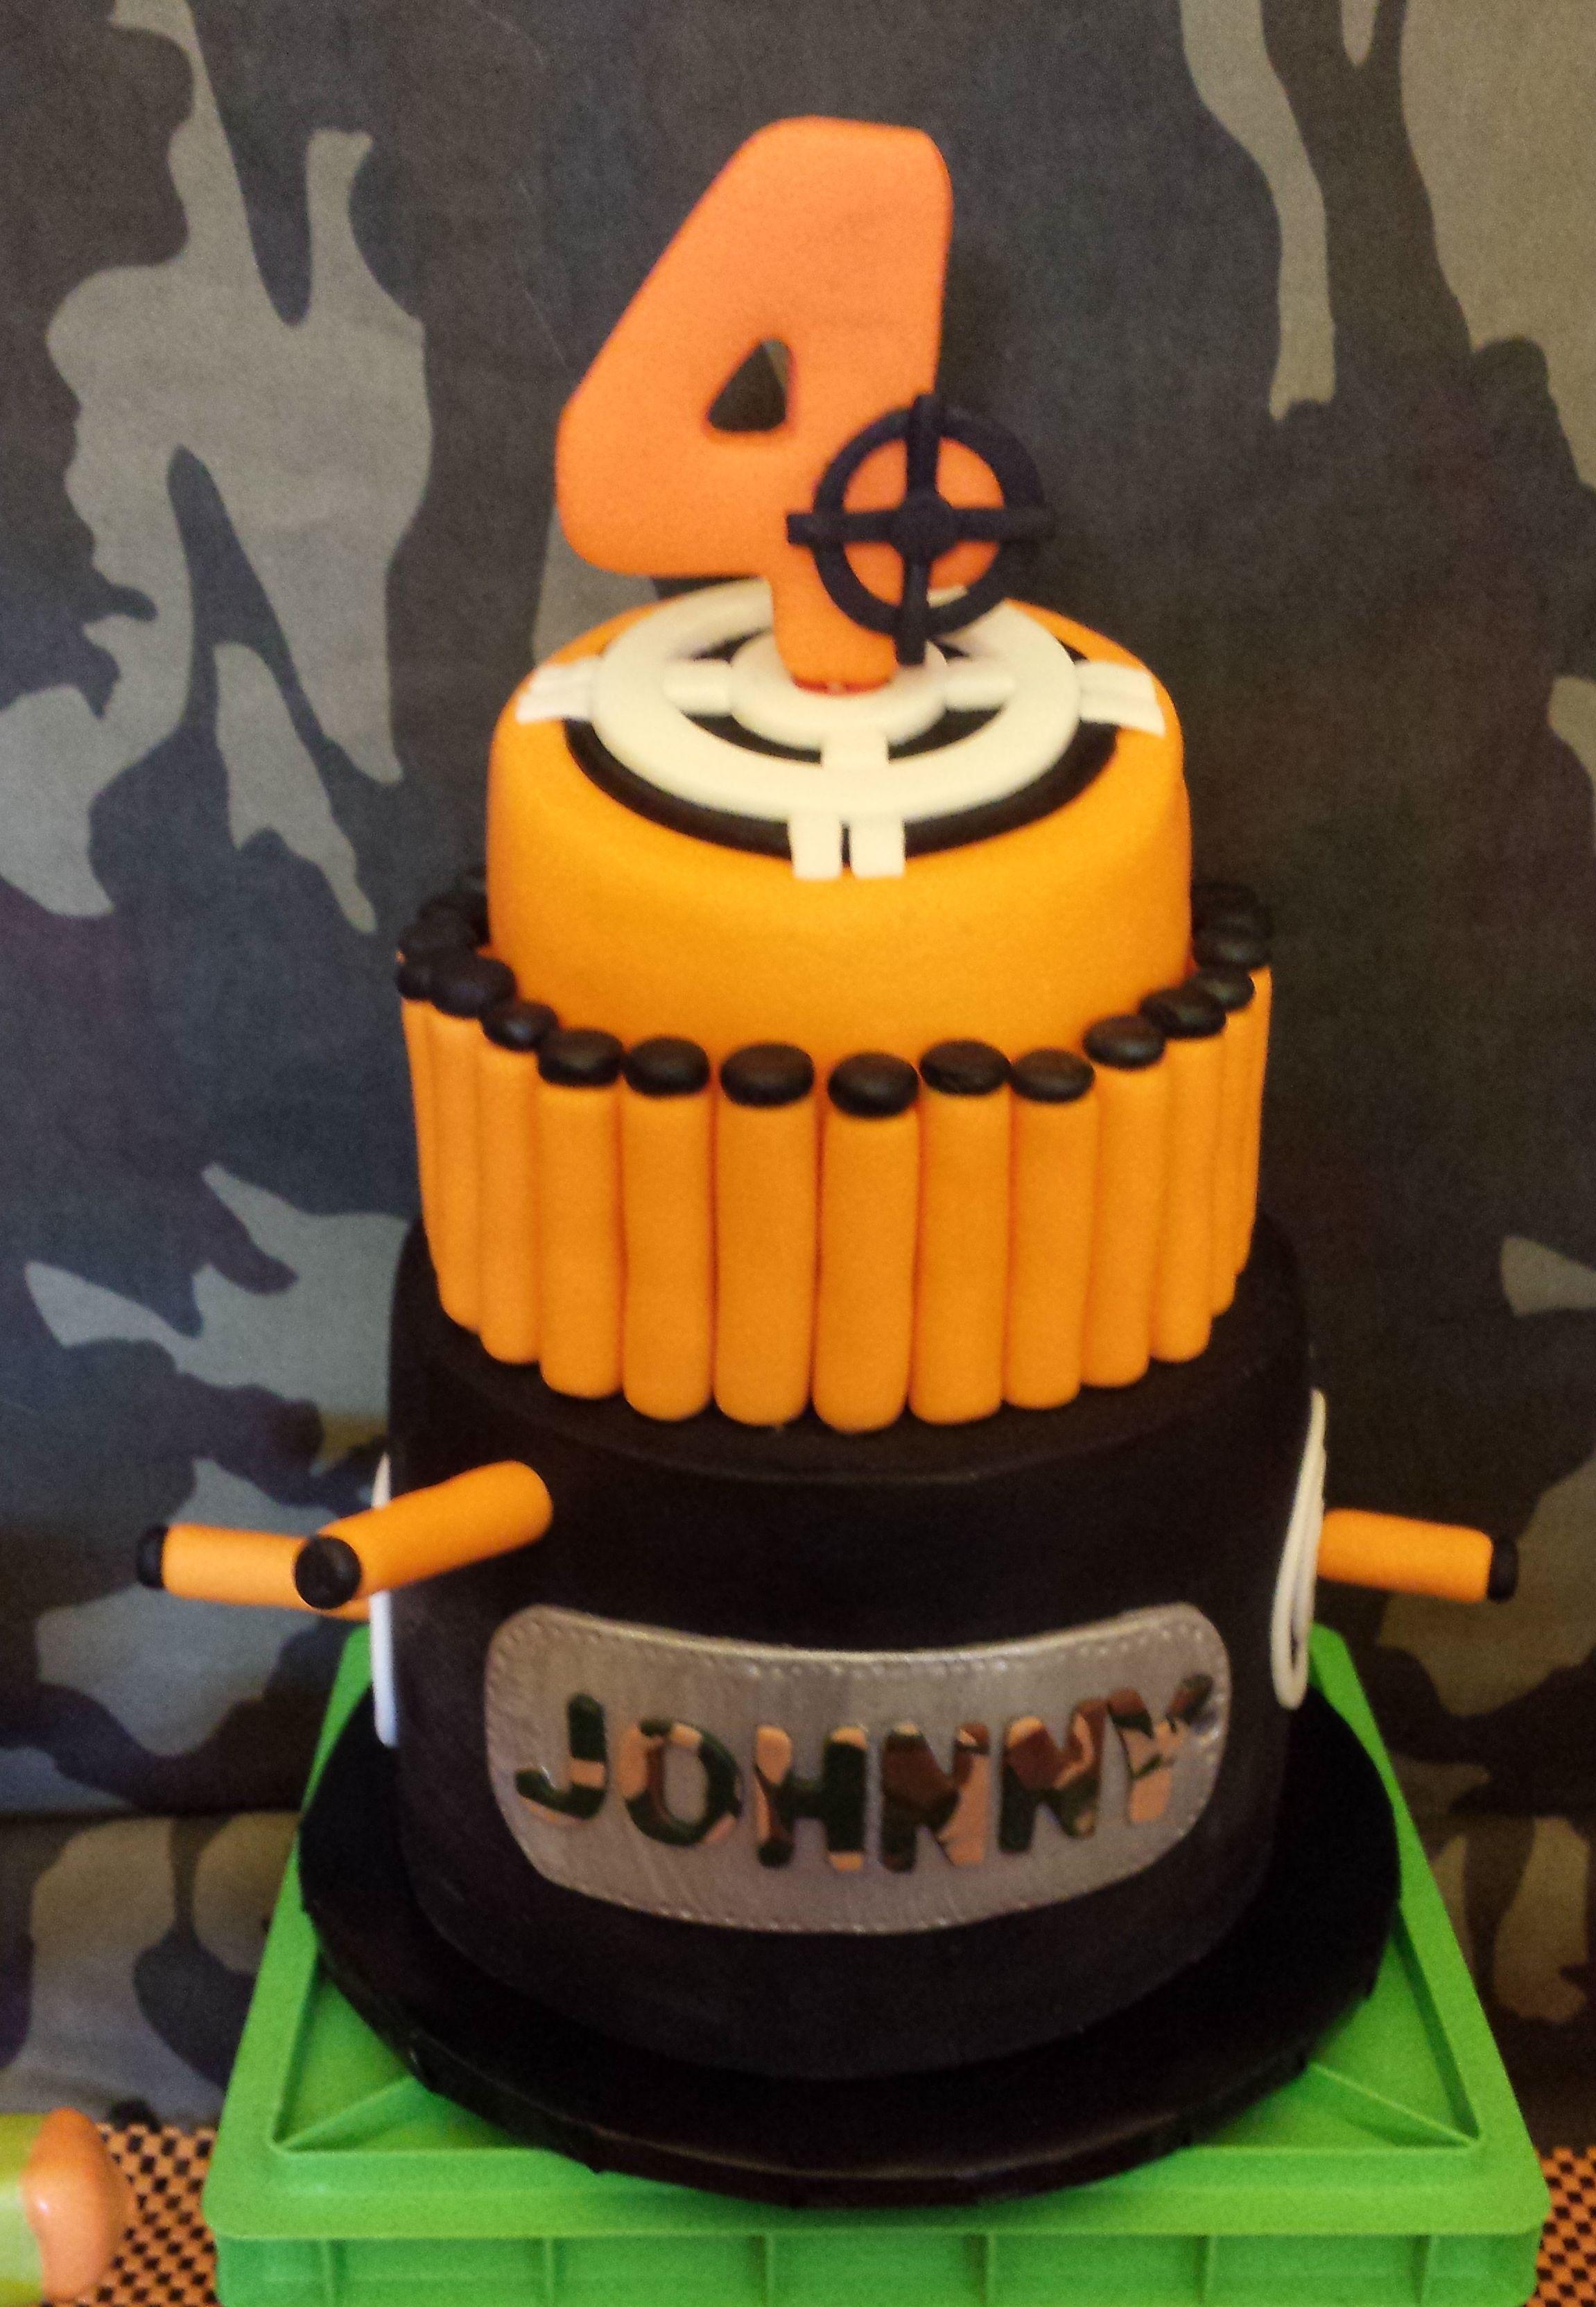 Nerf Gun Birthday Cake!!! Camouflage, Nerf Darts, Targets